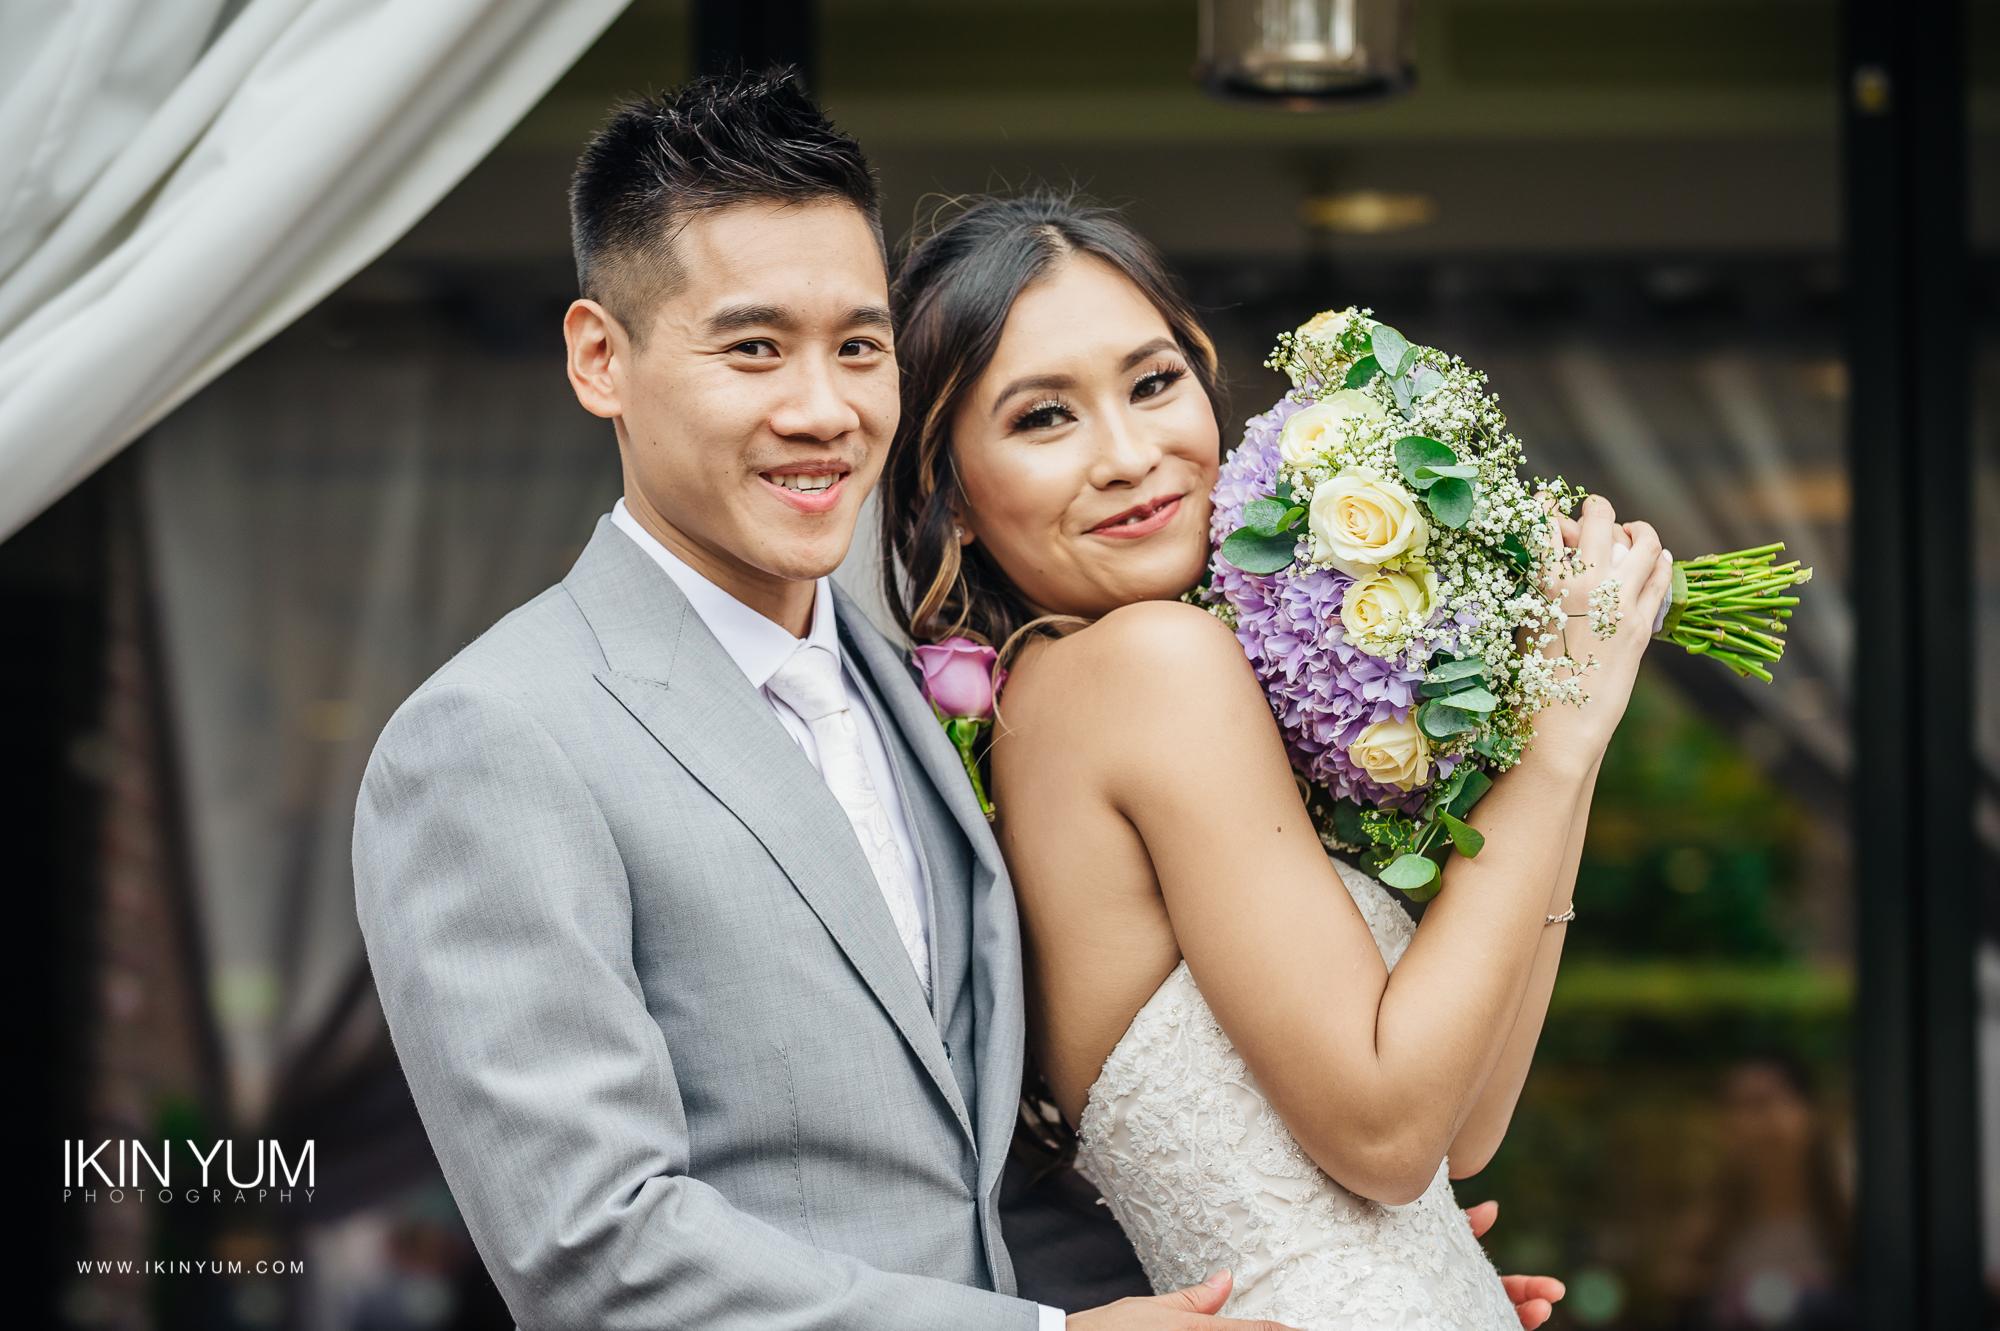 Syon Park Wedding - Ikin Yum Photography -097.jpg